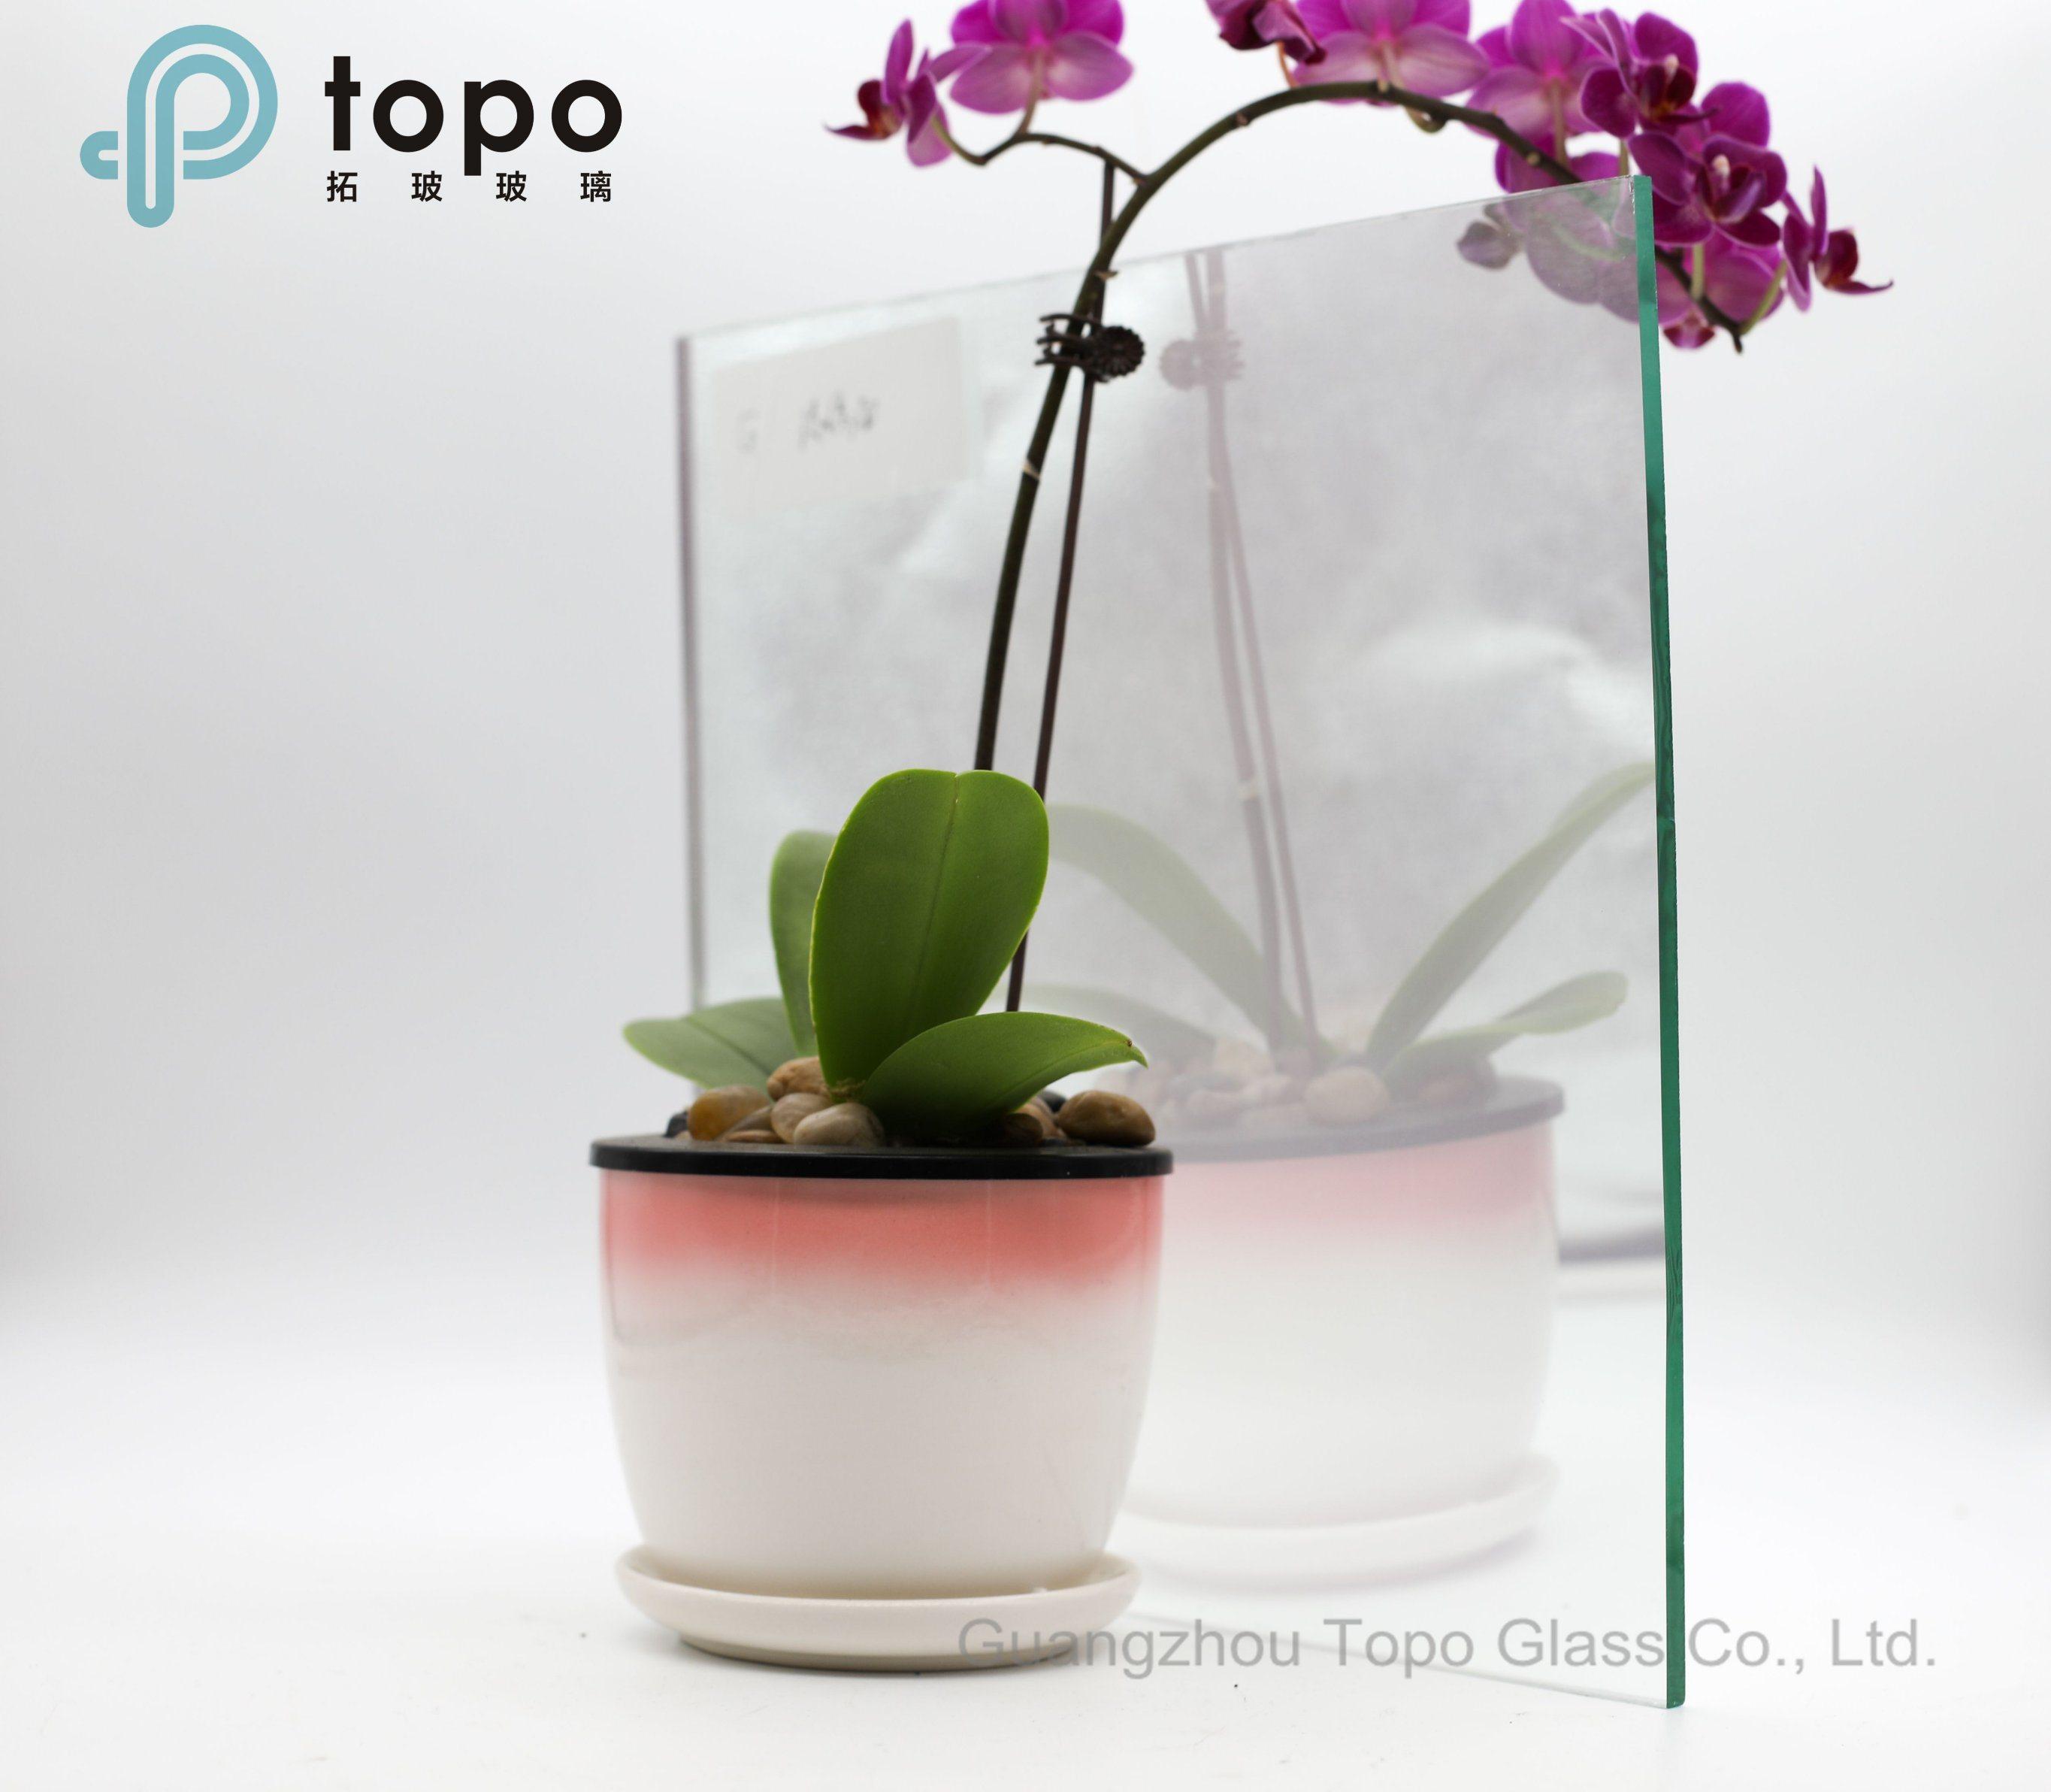 Top Quality Magic Mirror Glass / Car Mirror Glass (S-F7)